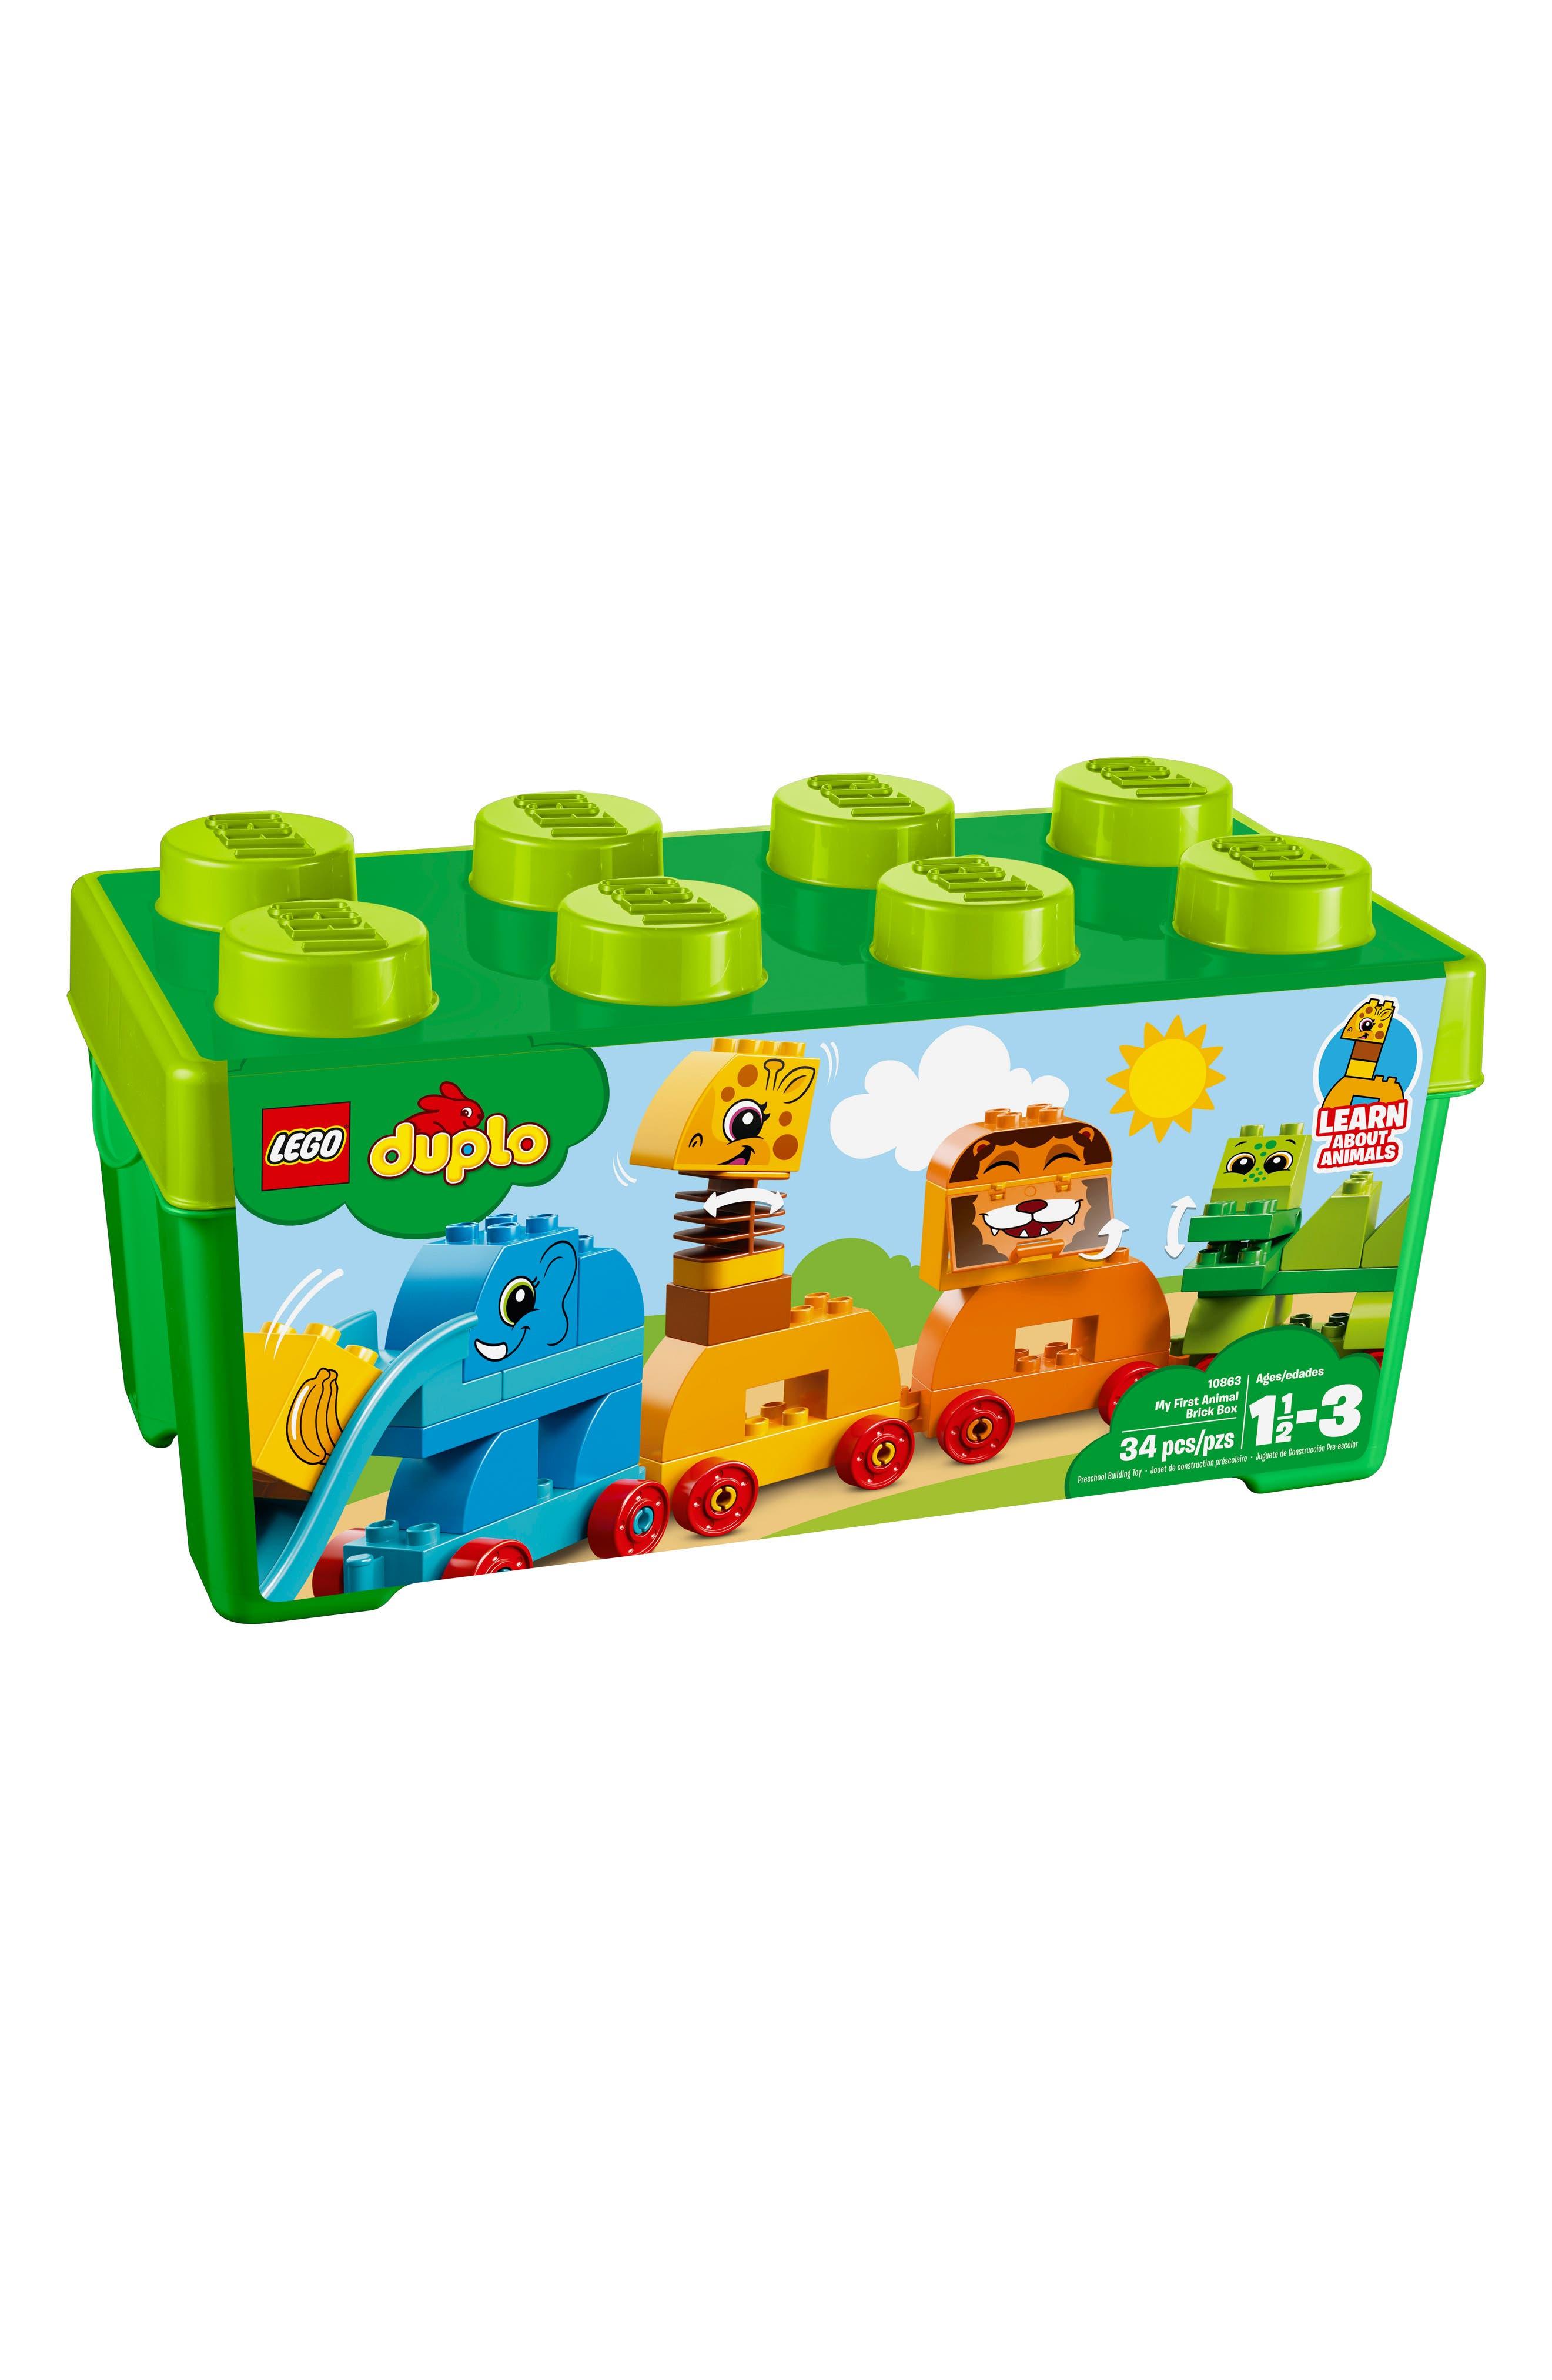 DUPLO<sup>®</sup> My First Animal Brick Box - 10863,                             Main thumbnail 1, color,                             MULTI